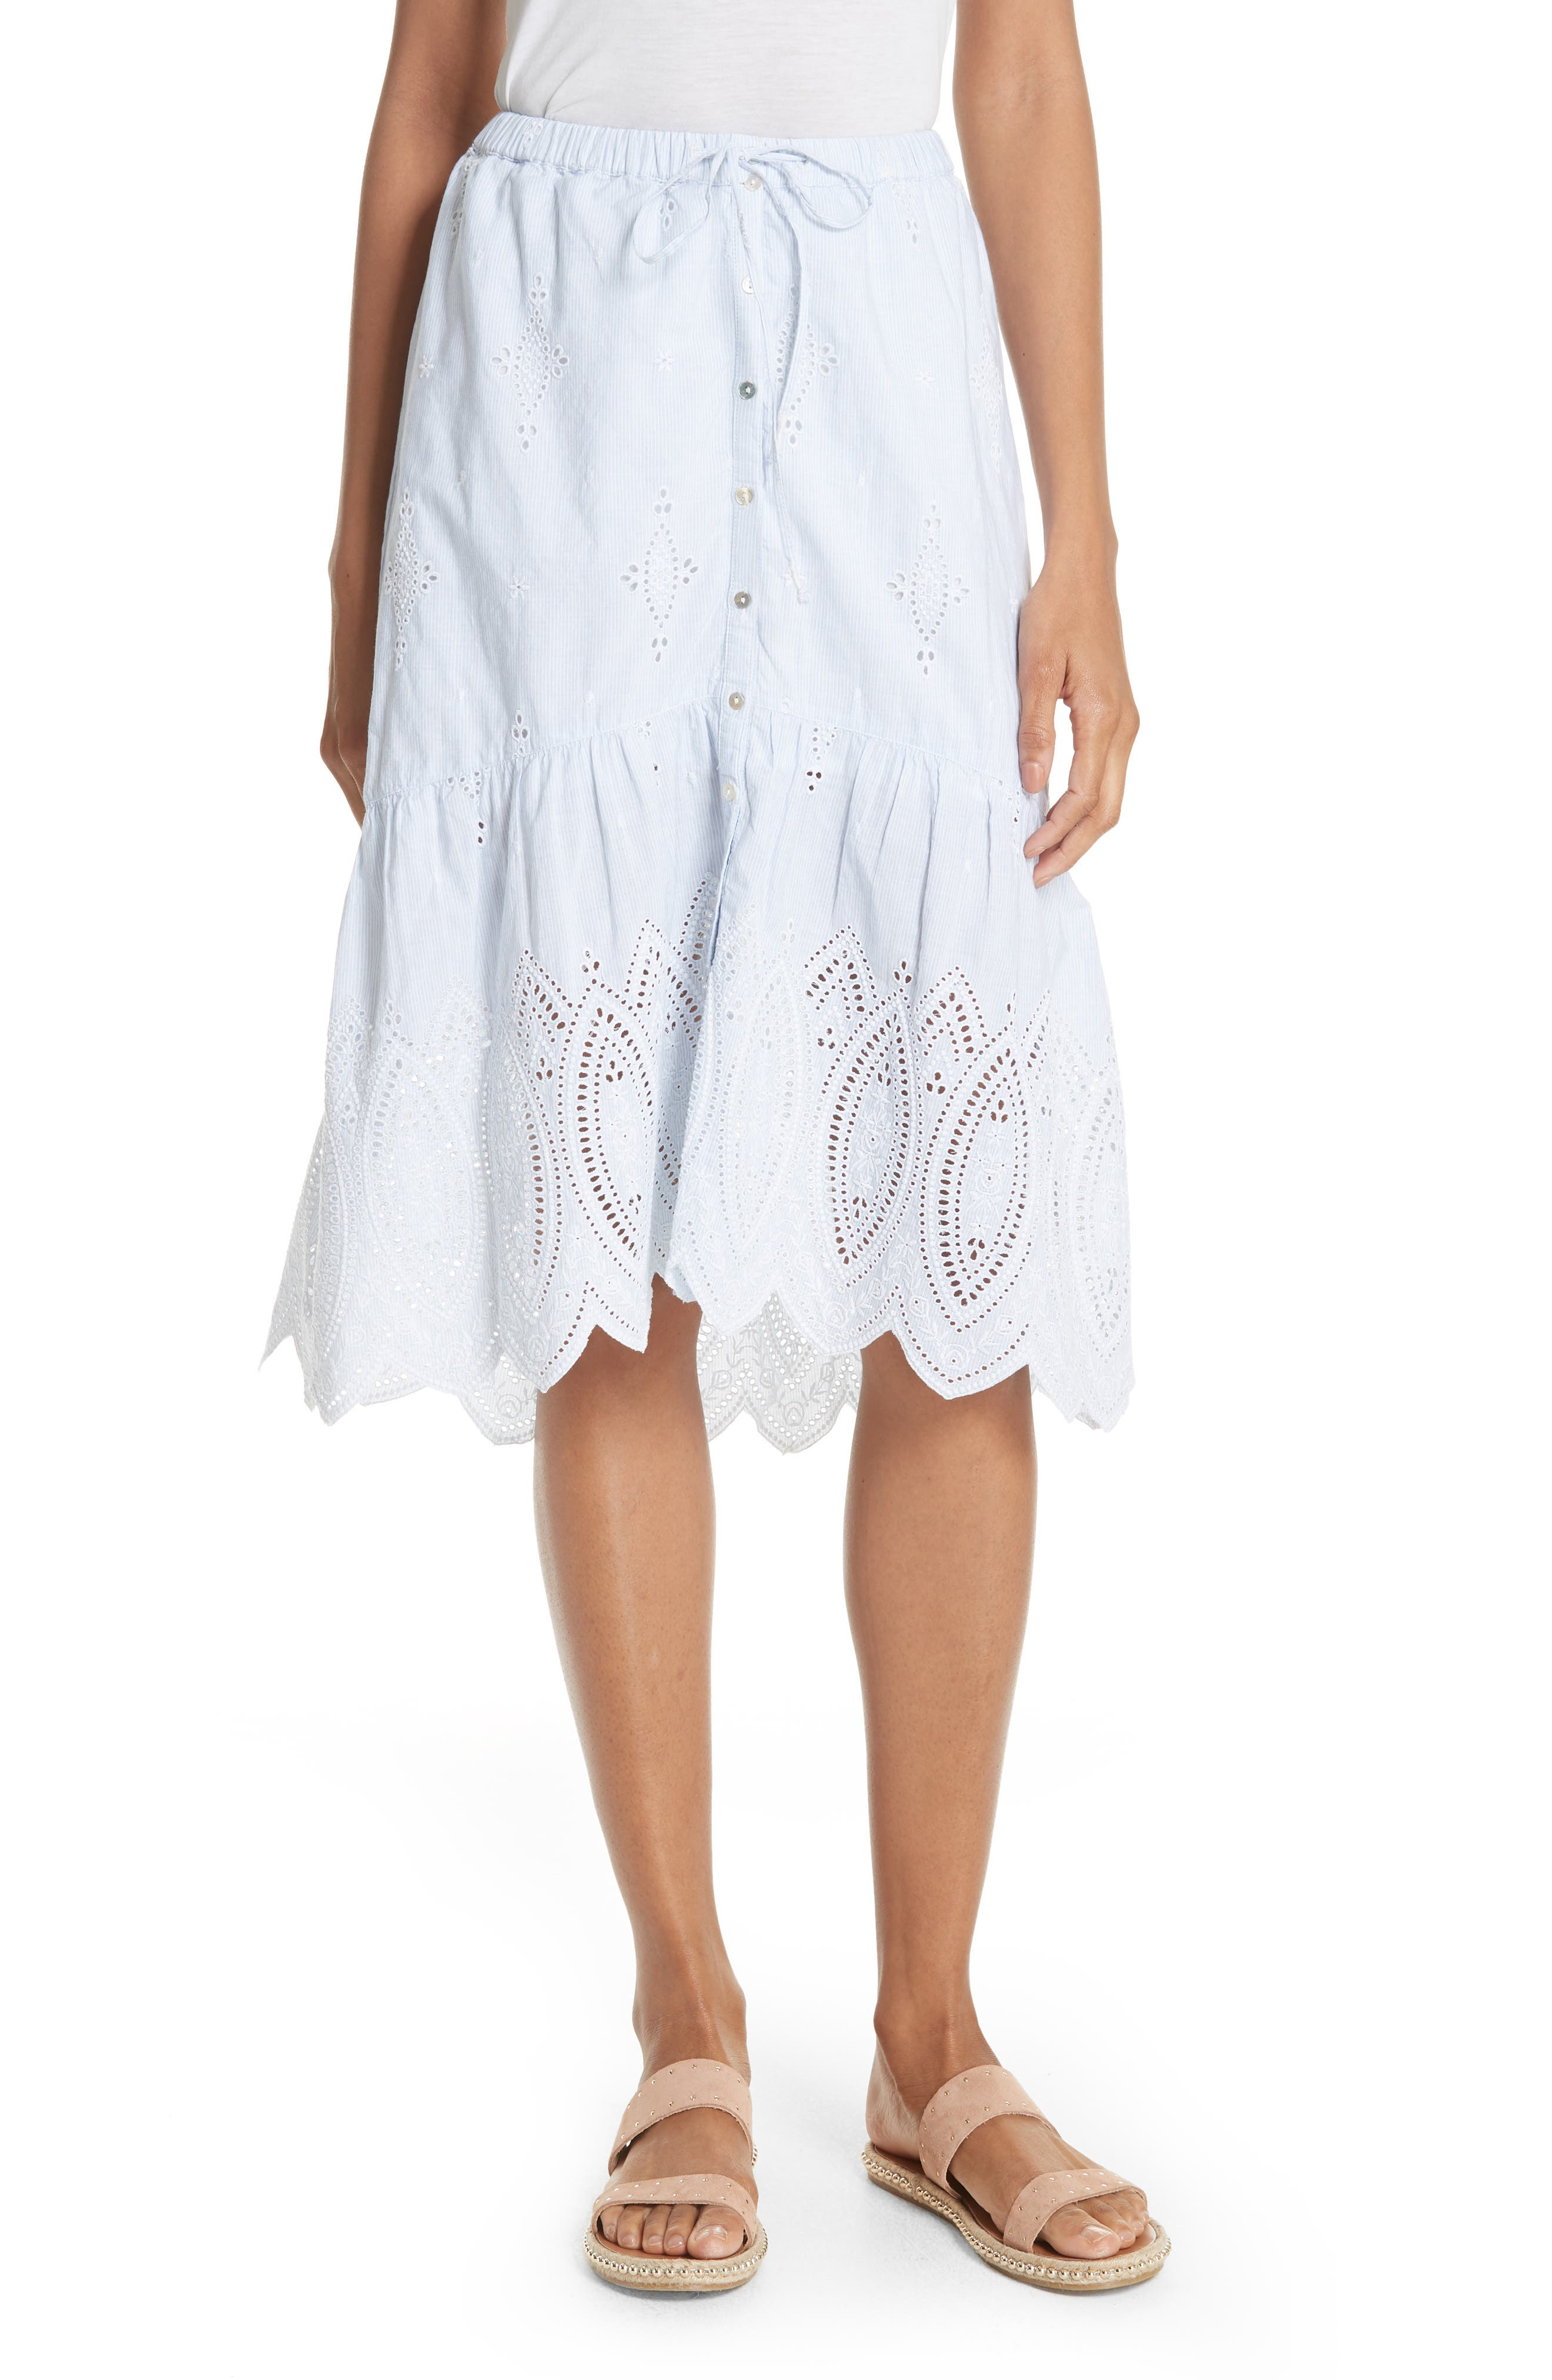 Joie Chantoya Eyelet Scallop Hem Cotton Skirt